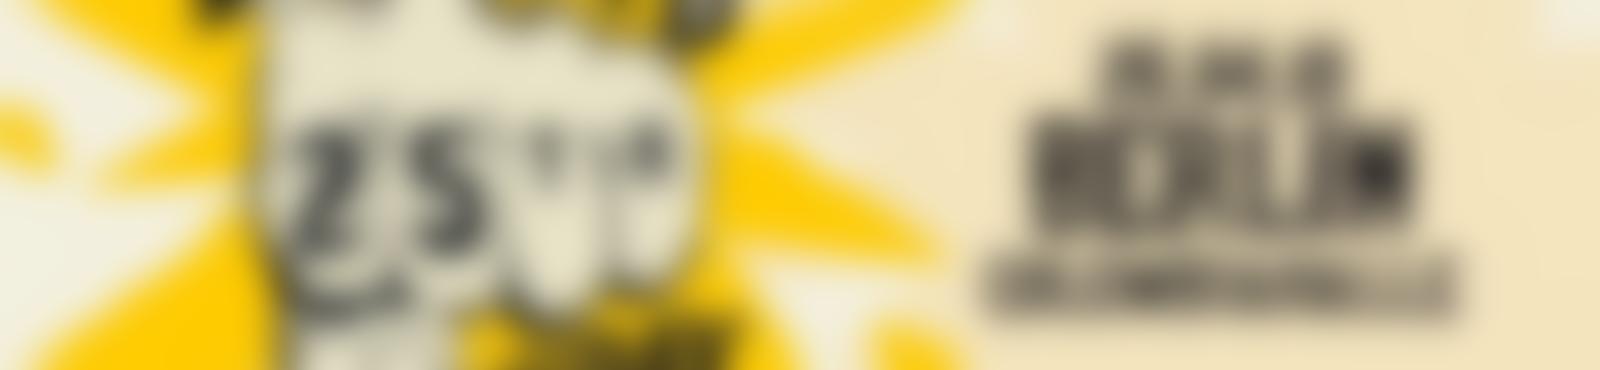 Blurred 0ac741cd b669 4497 8f08 97b021c5ca2c